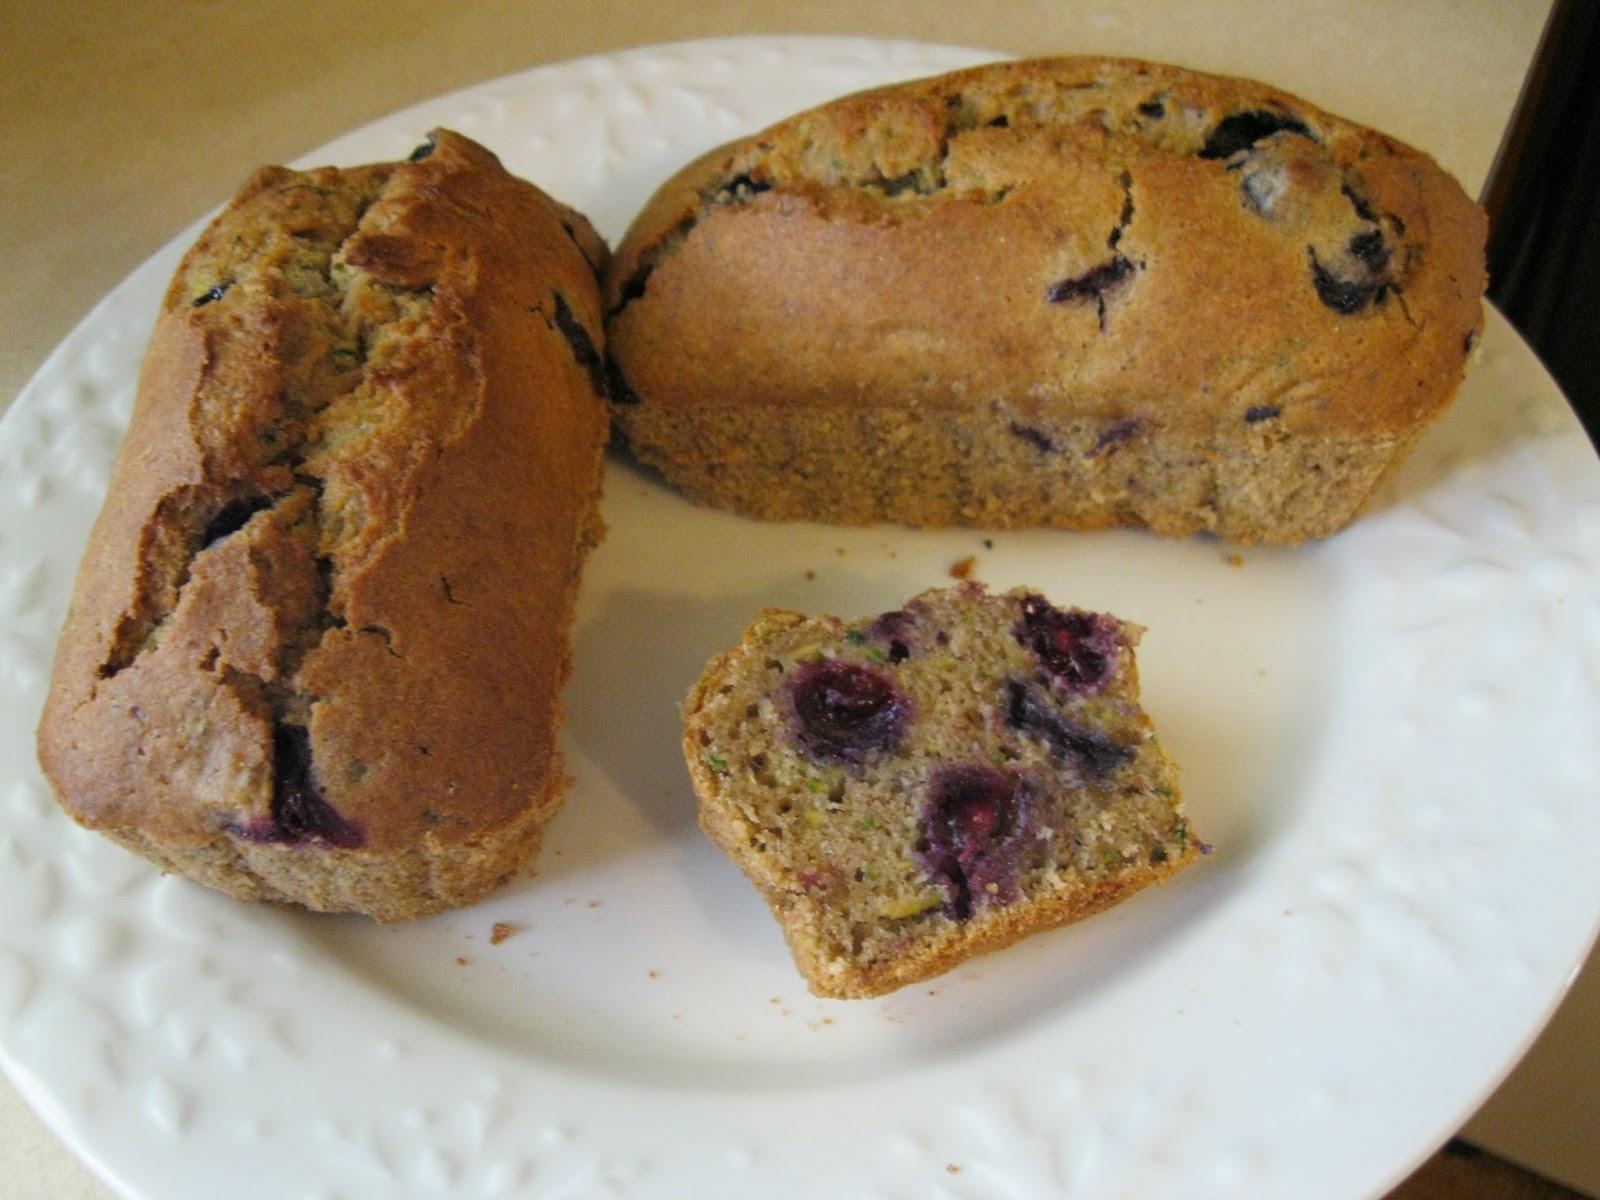 Gluten free blueberry zucchini bread